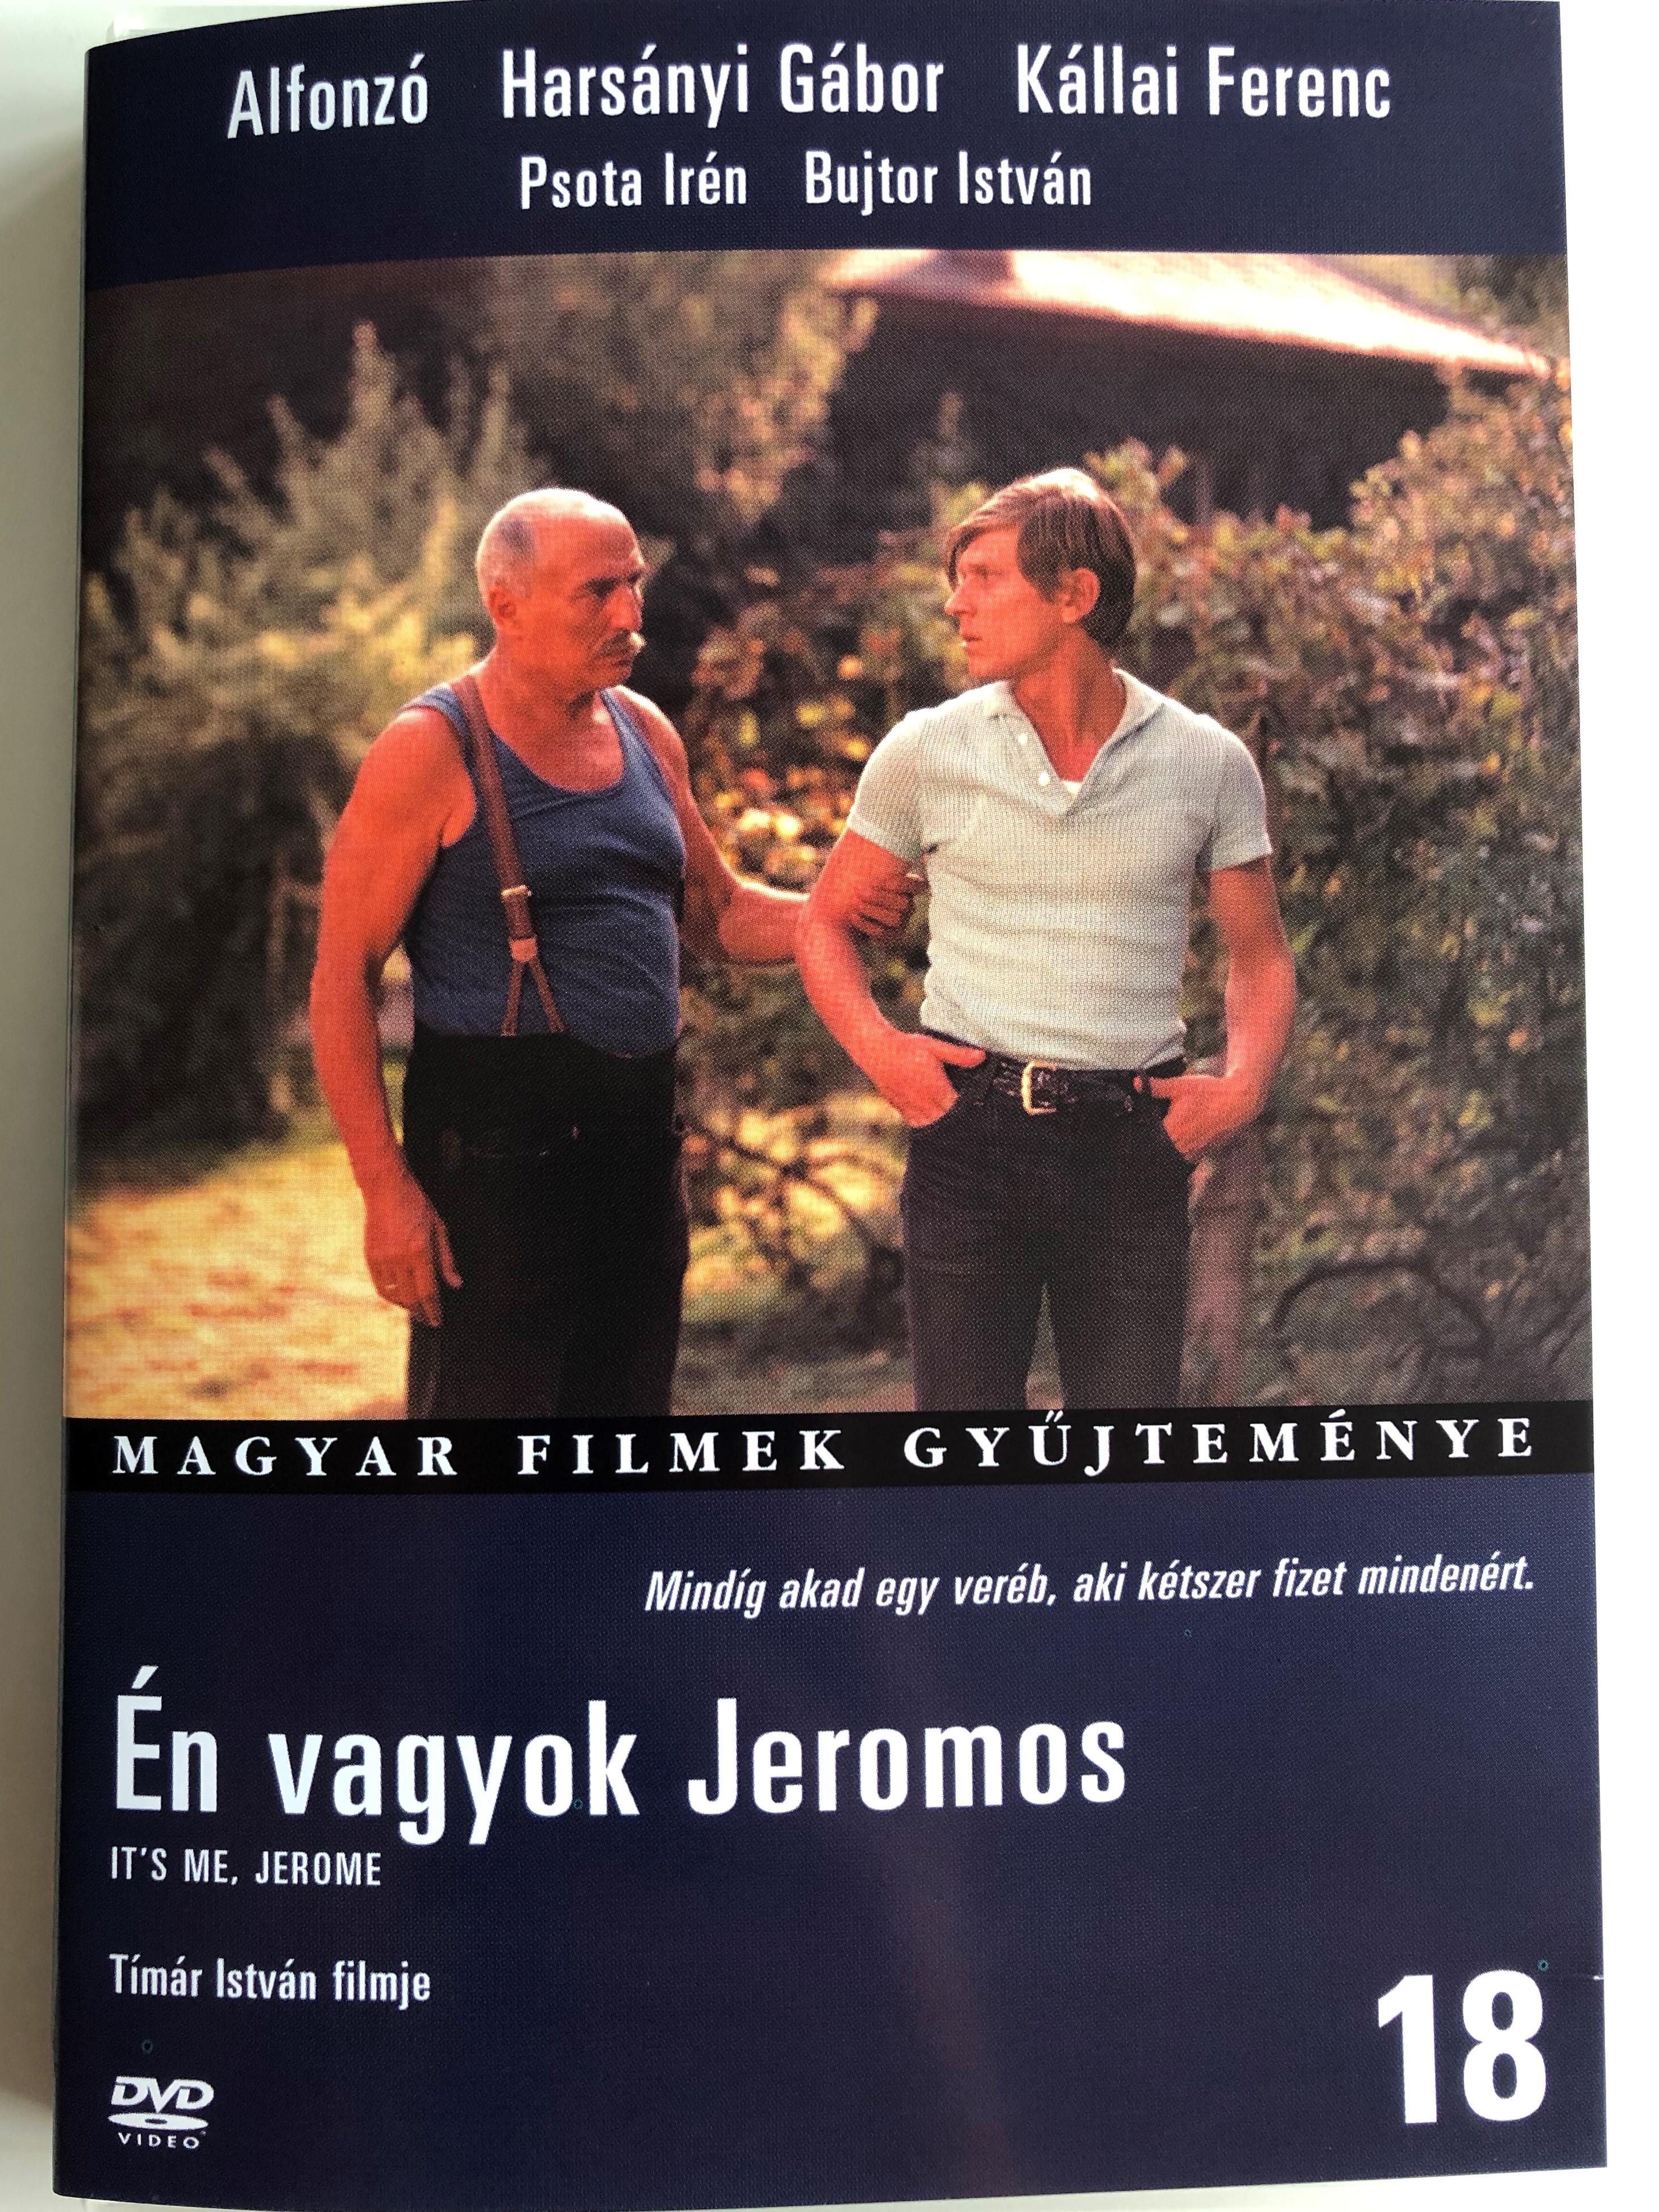 -n-vagyok-jeromos-dvd-1970-it-s-me-jerome-directed-by-t-m-r-istv-n-1.jpg